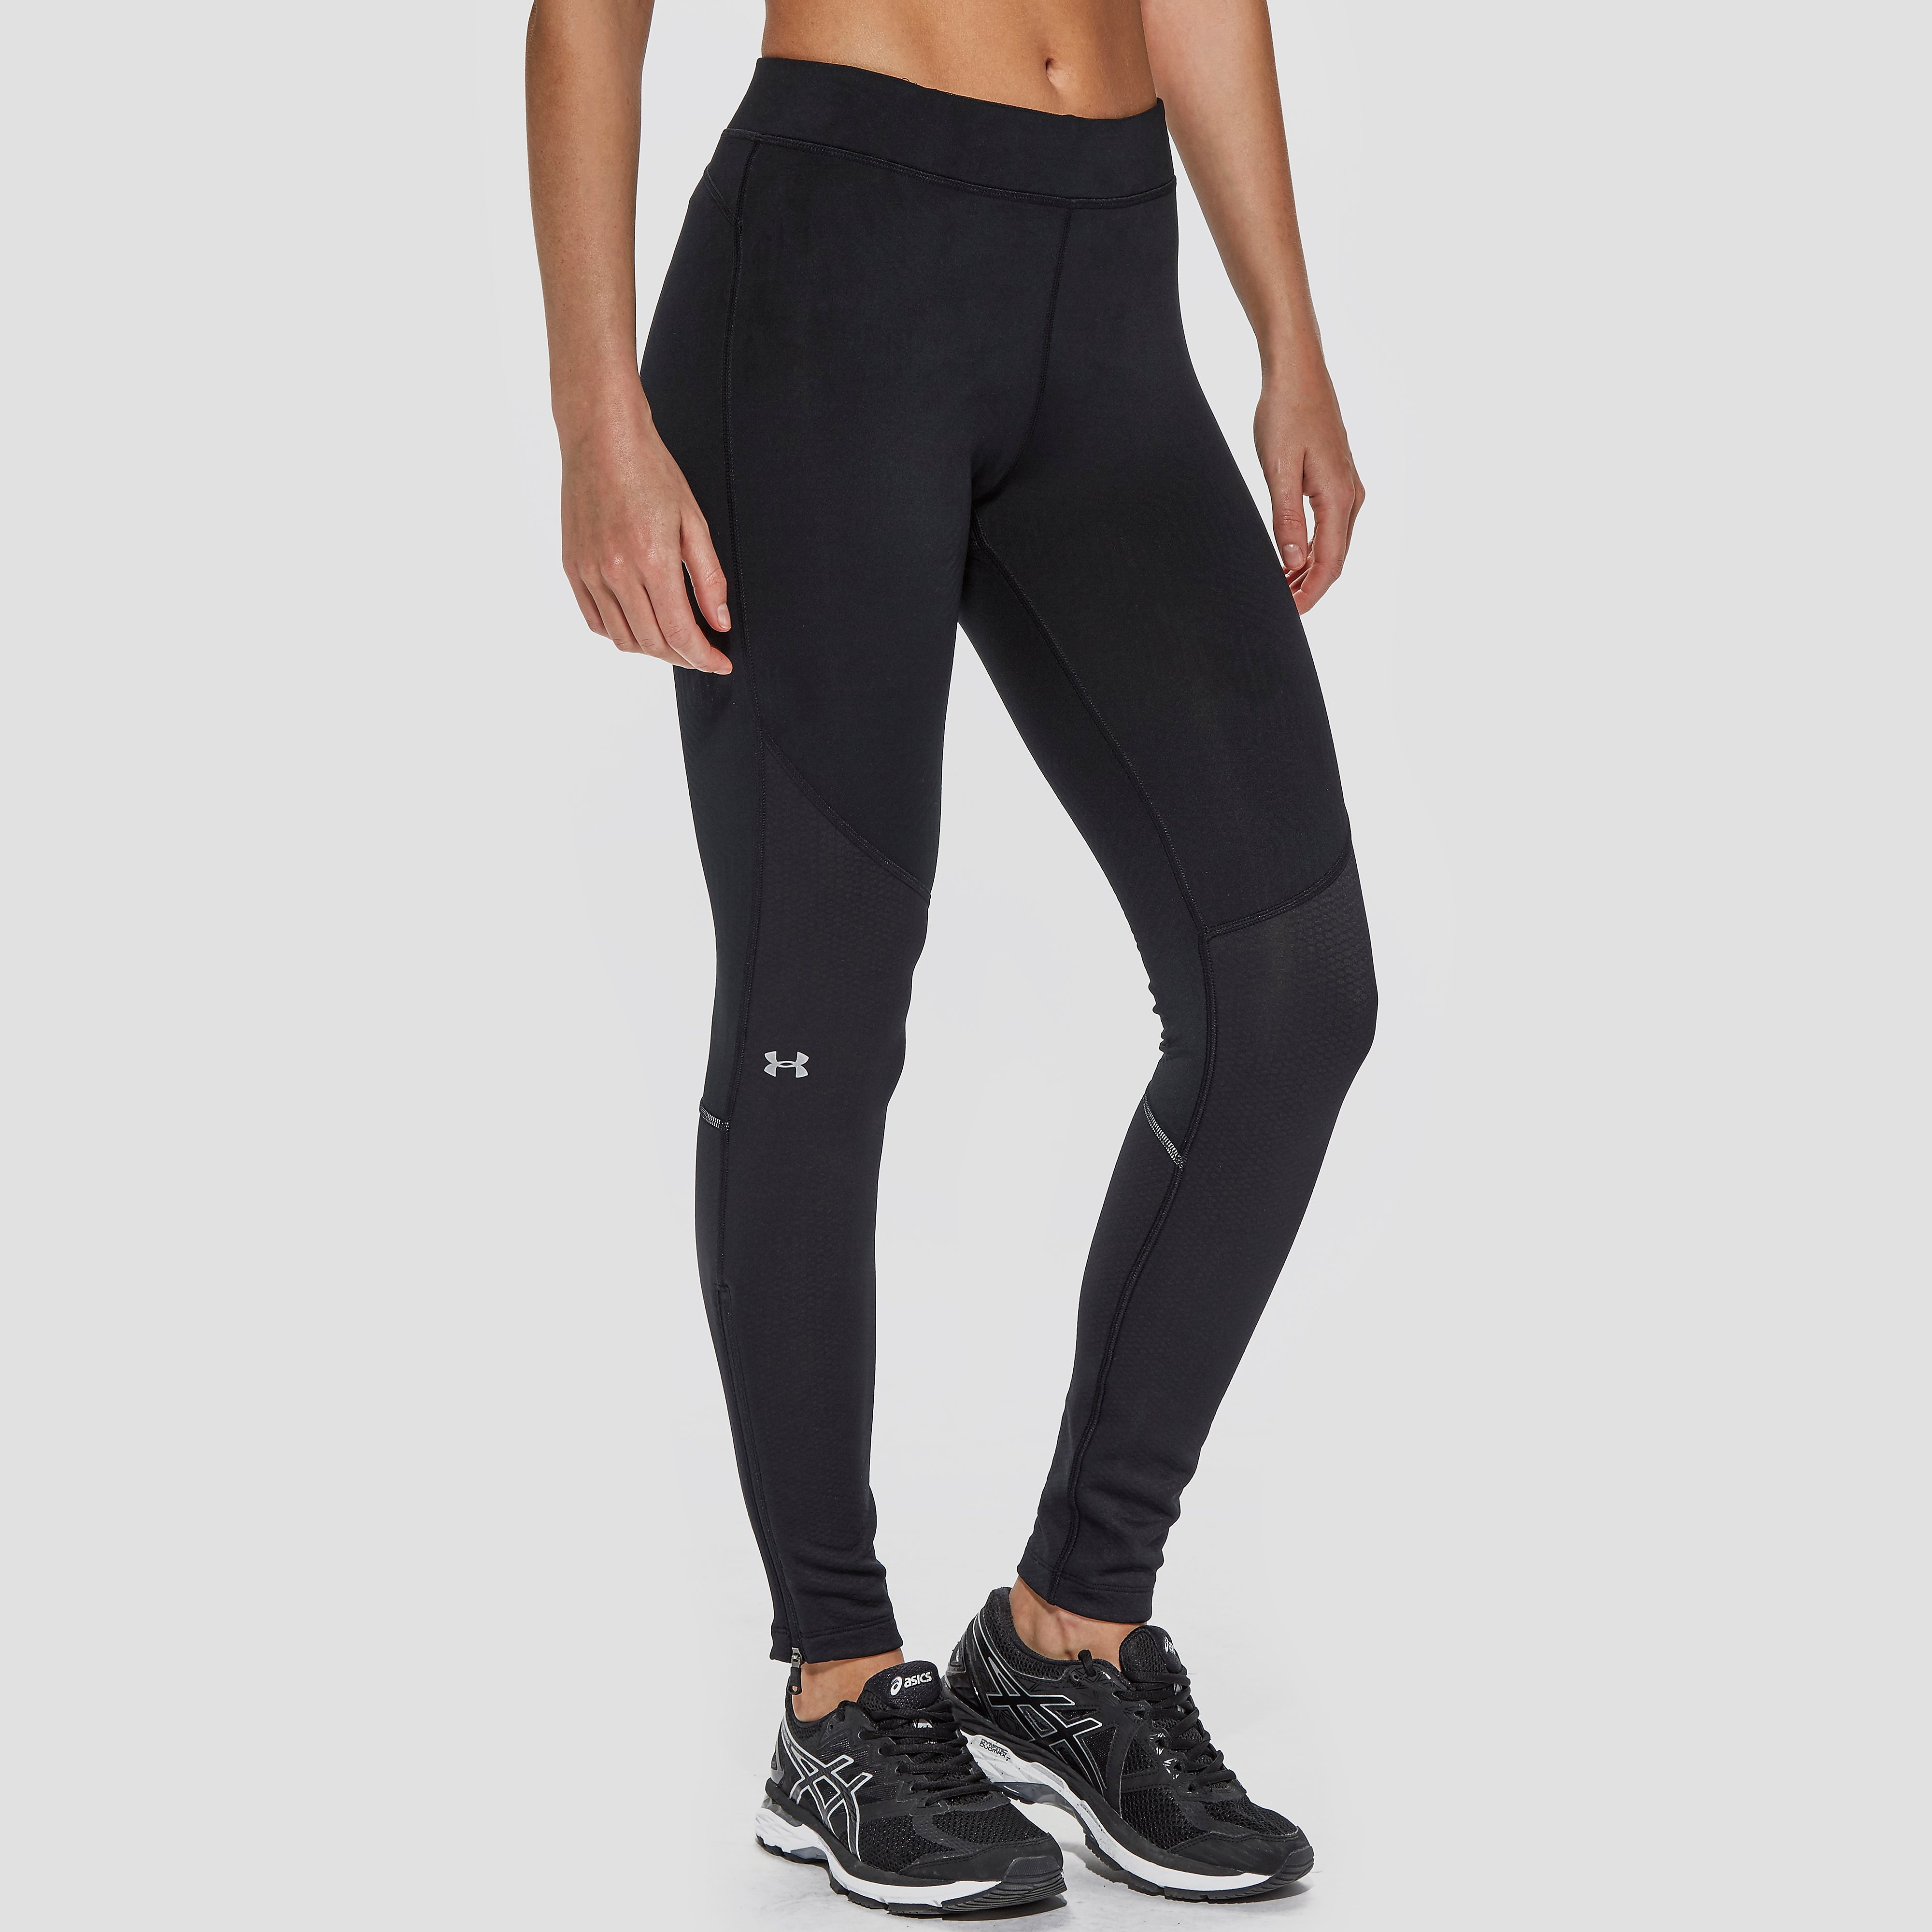 Under Armour ColdGear Elements Women's Running Leggings